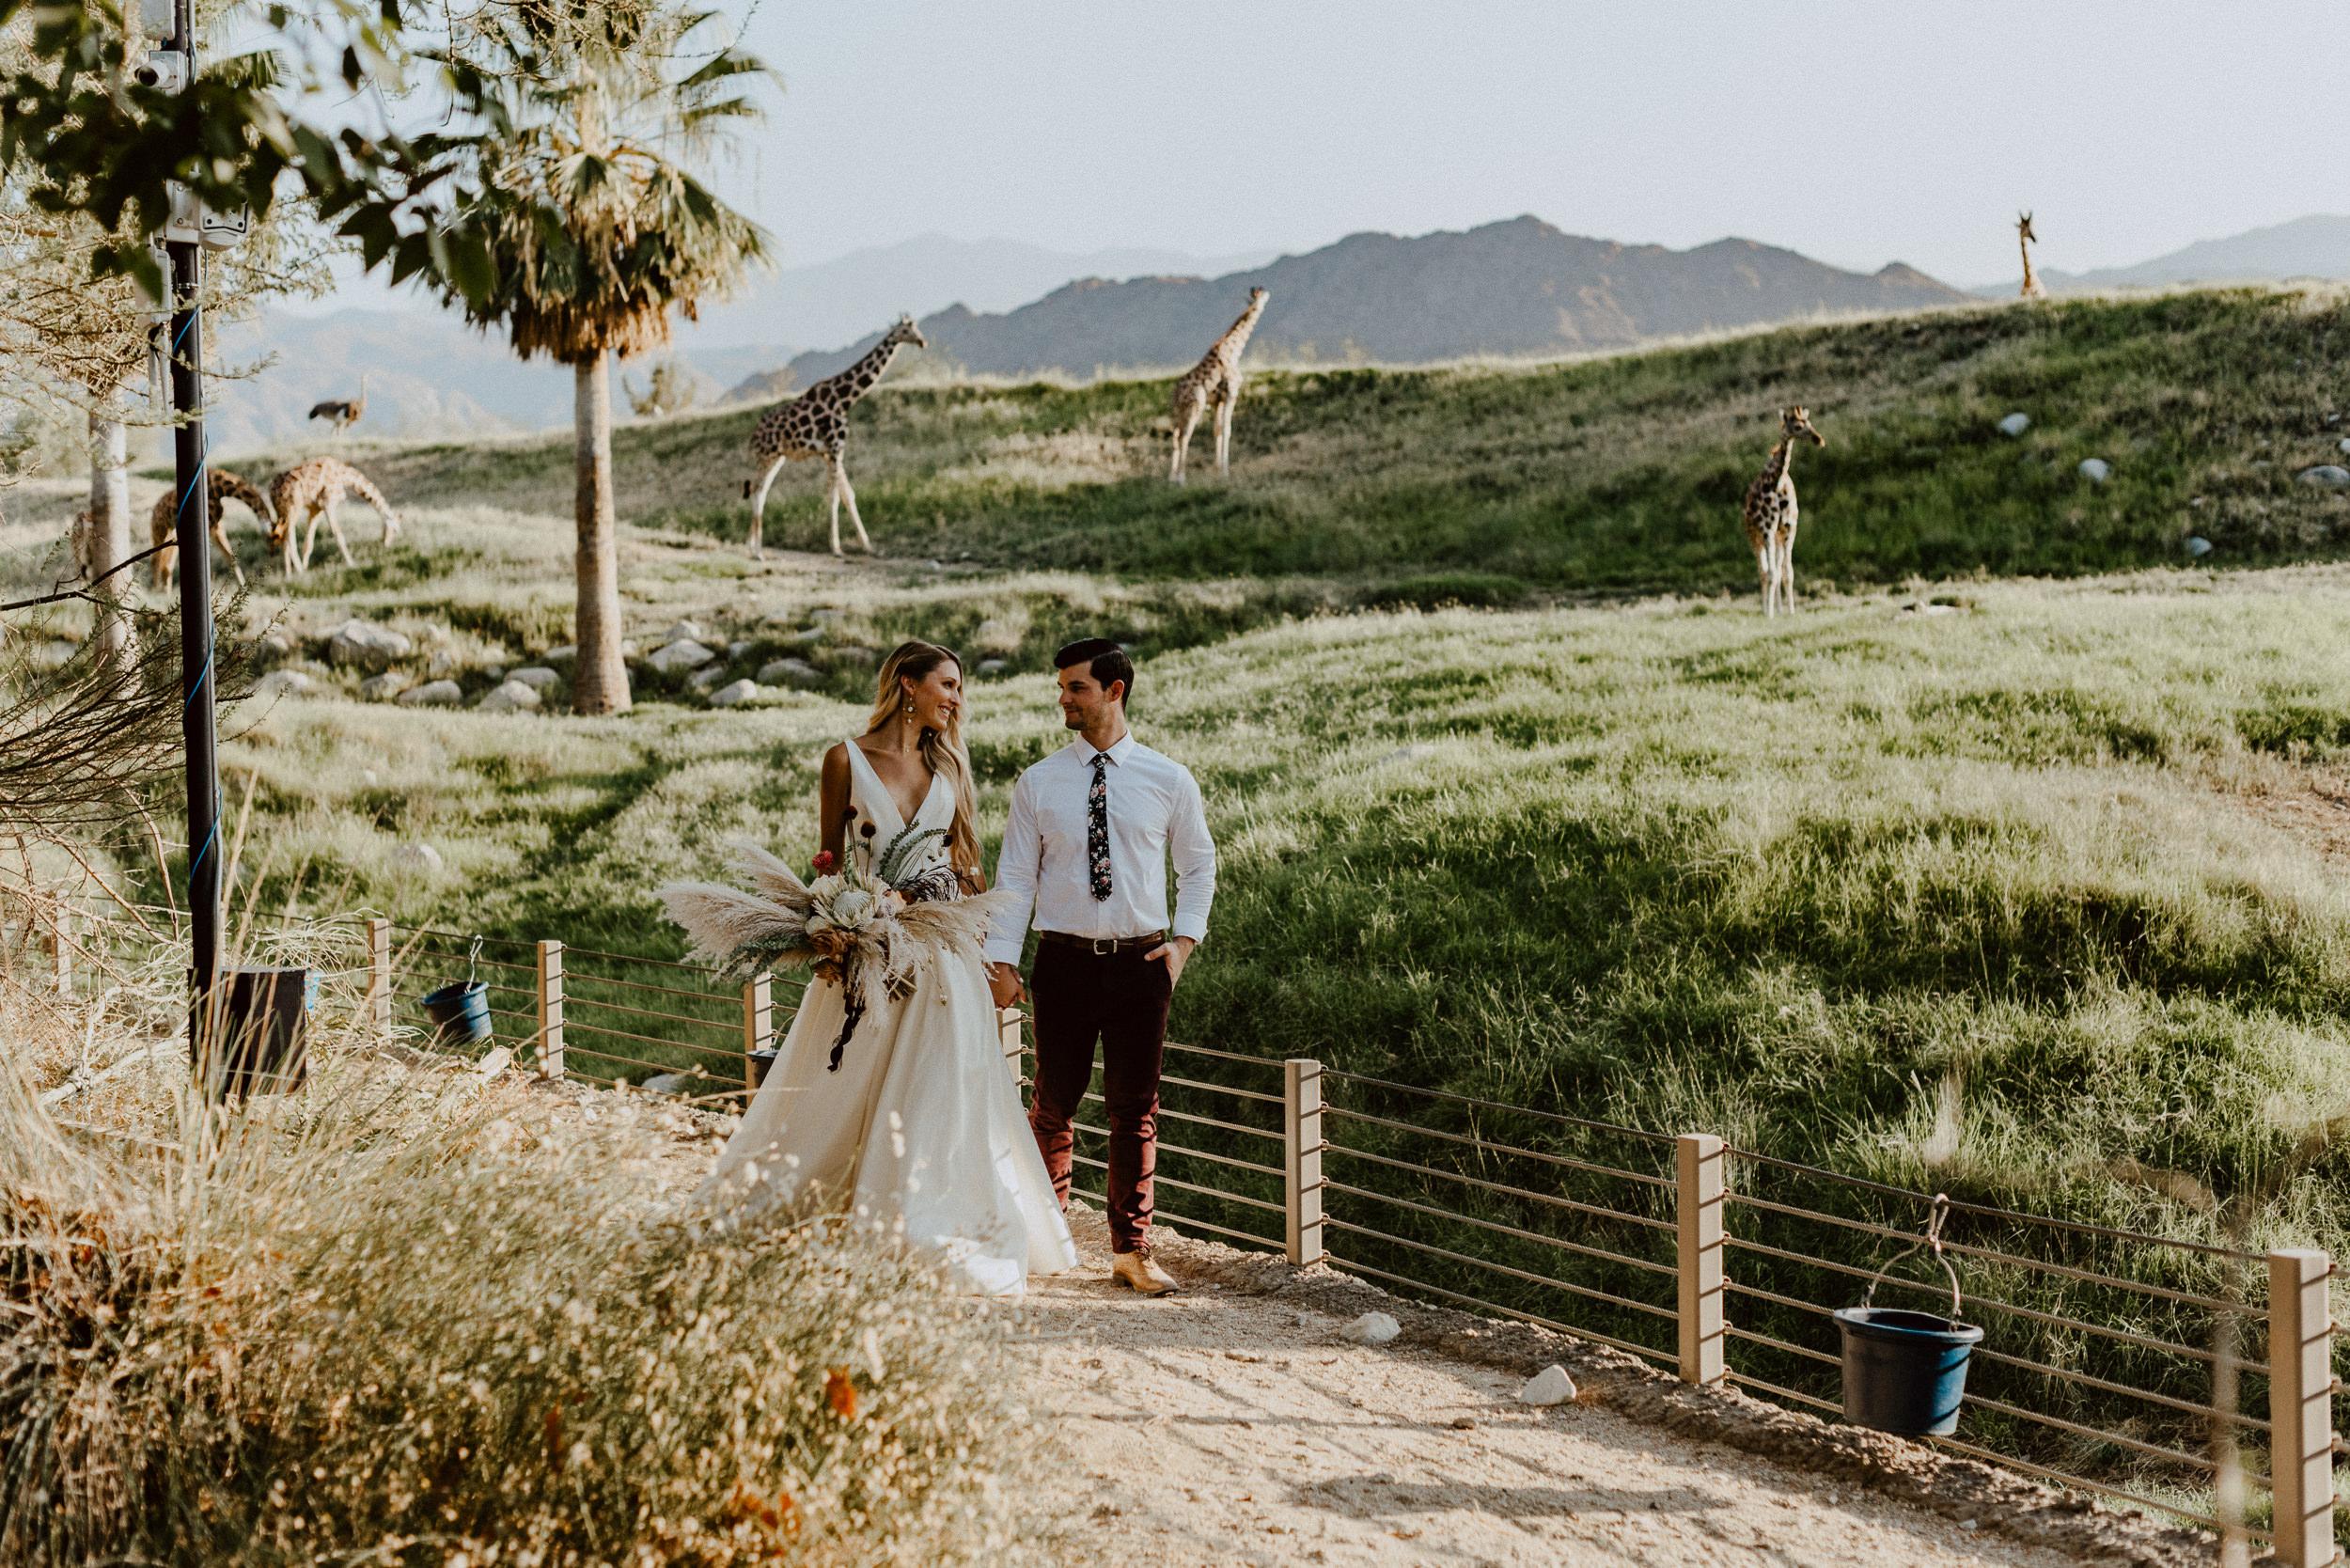 sChelsie + Chris - The Desert Shootout Wedding Romantics at The Living Desert-87.jpg